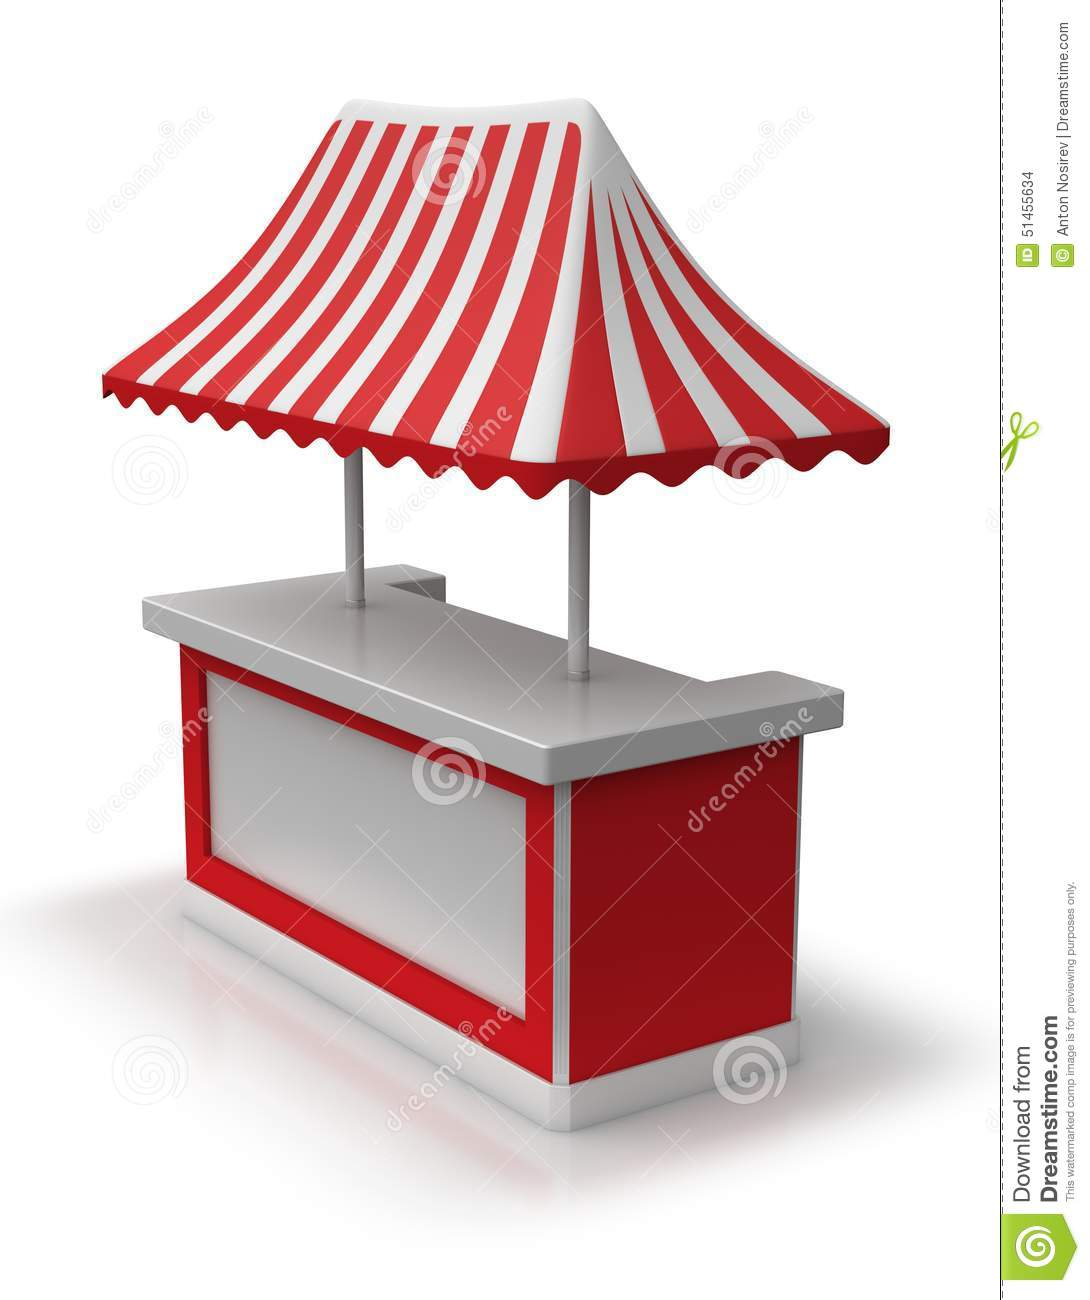 Red Market Tent Stock Illustration.